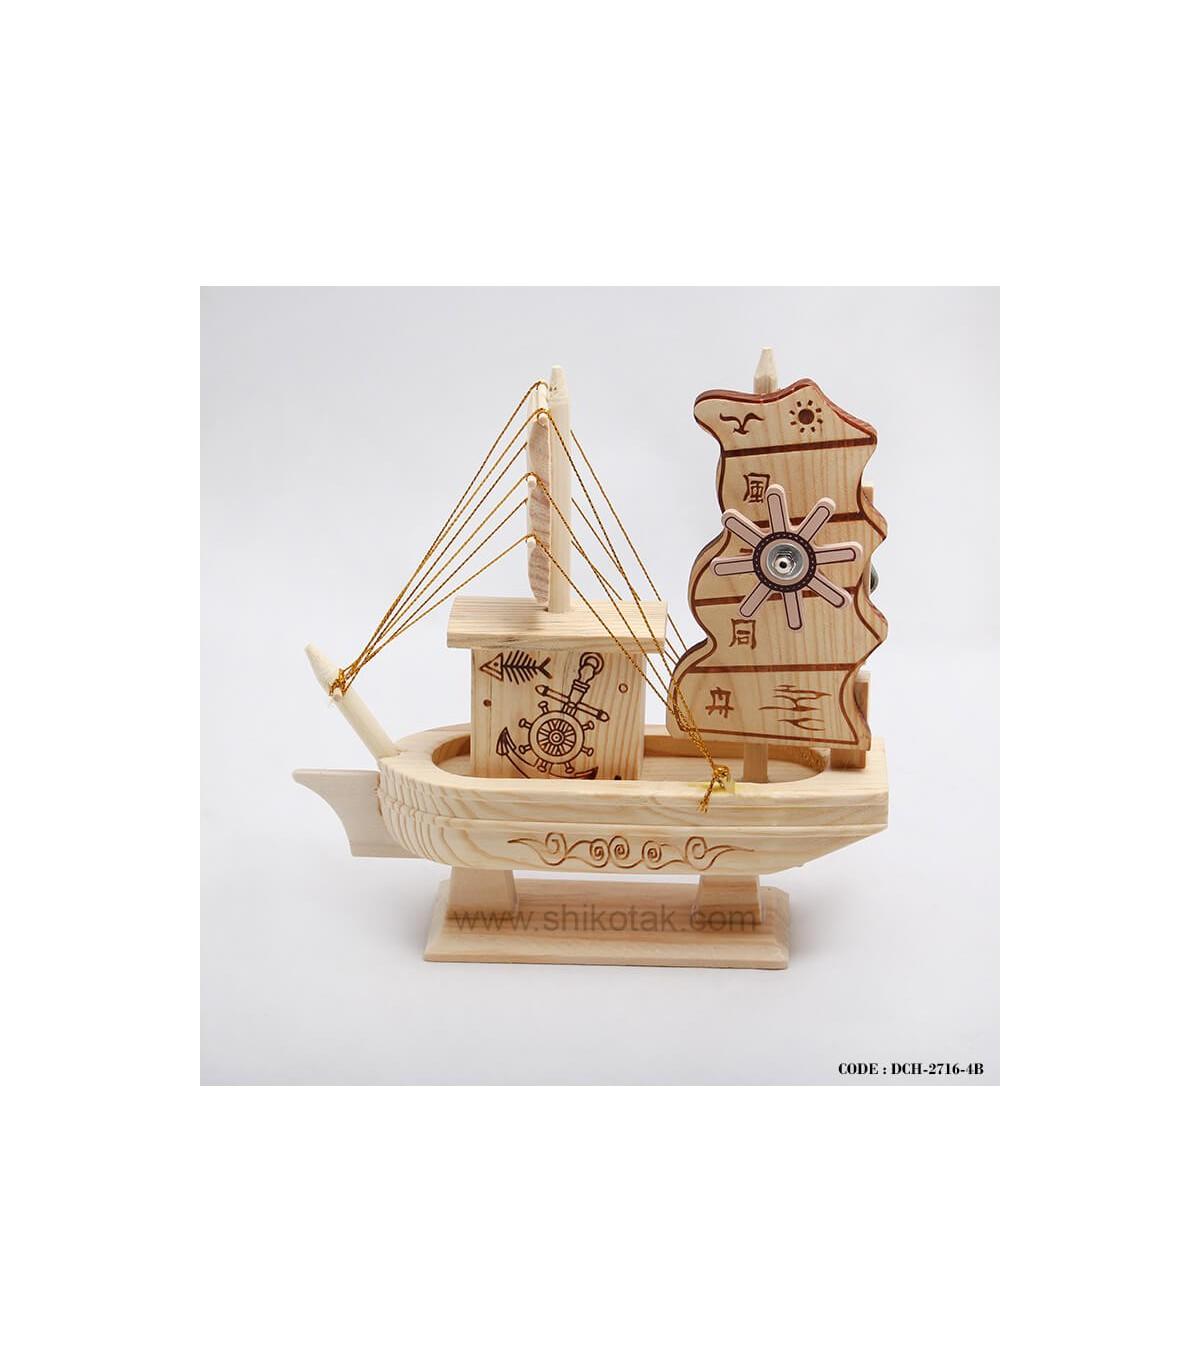 کشتی بادبانی موزیکالی سری4B